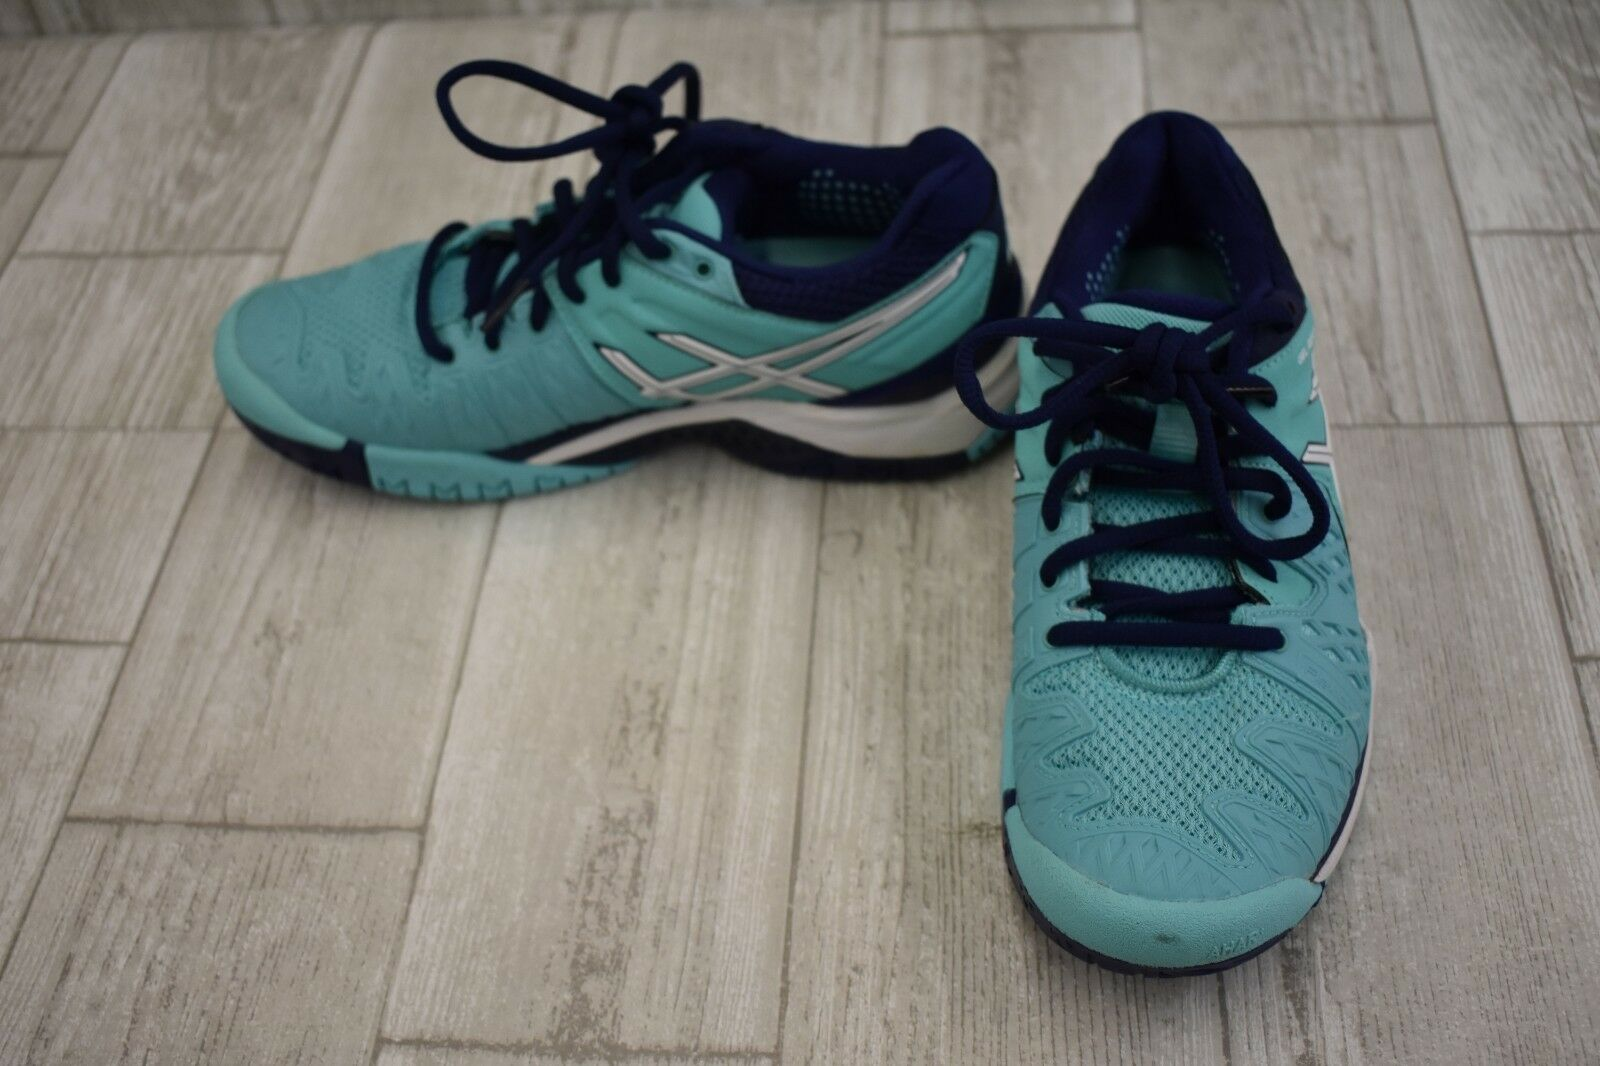 ASICS Donna Donna Donna  GEL-Resolution 6 Tennis scarpe-Donna  Dimensione 5.5 Pool blu ef4a9c